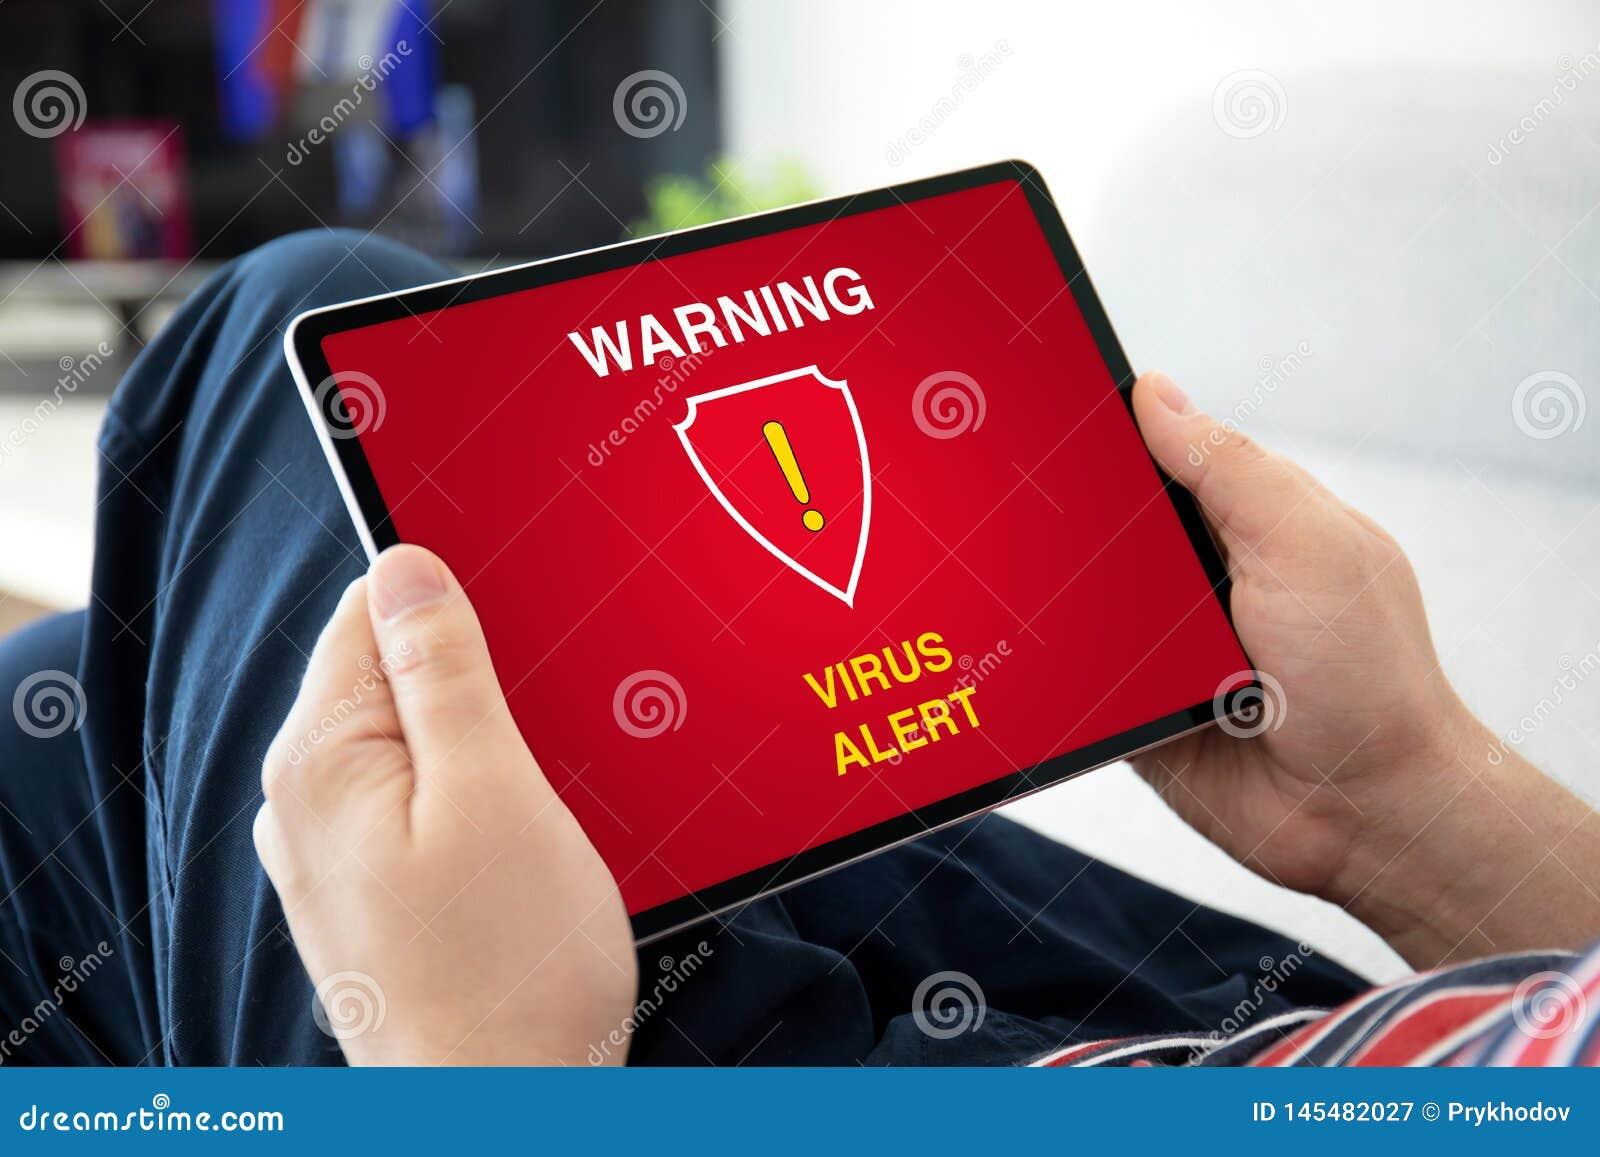 Man hands holding computer tablet with warning virus alert